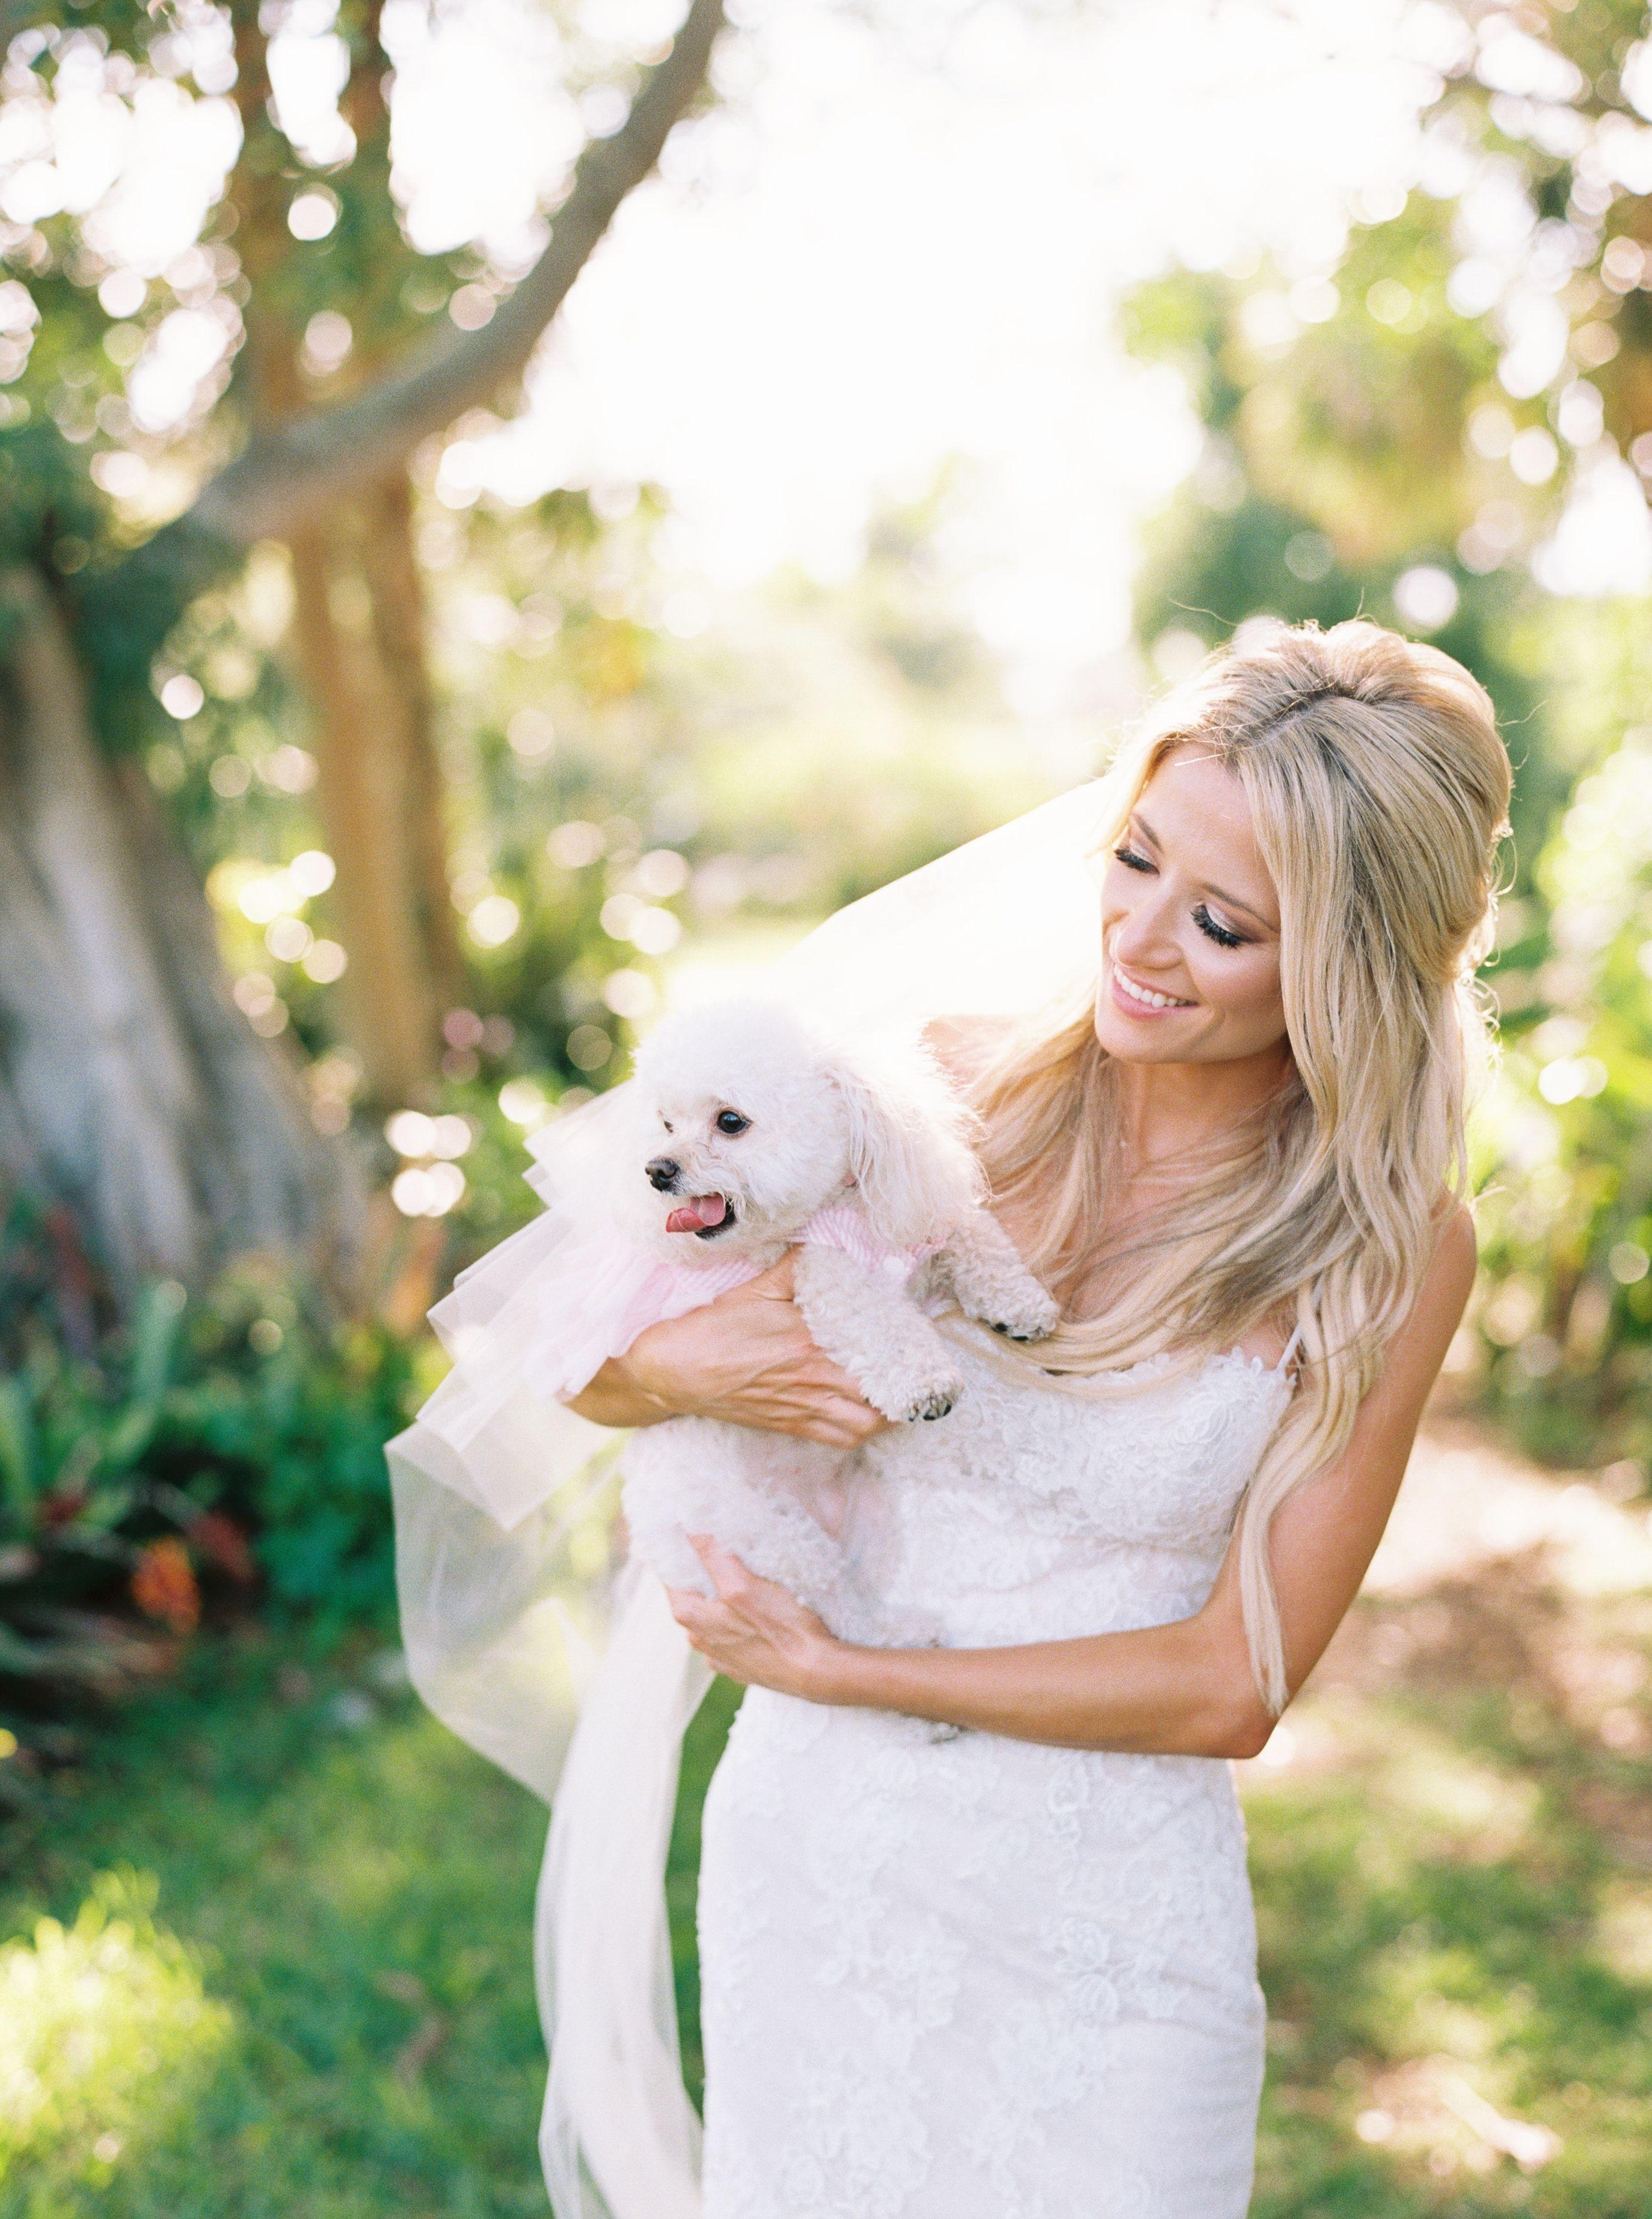 Bride with puppy, bridal portrait with dog, sarasota fine